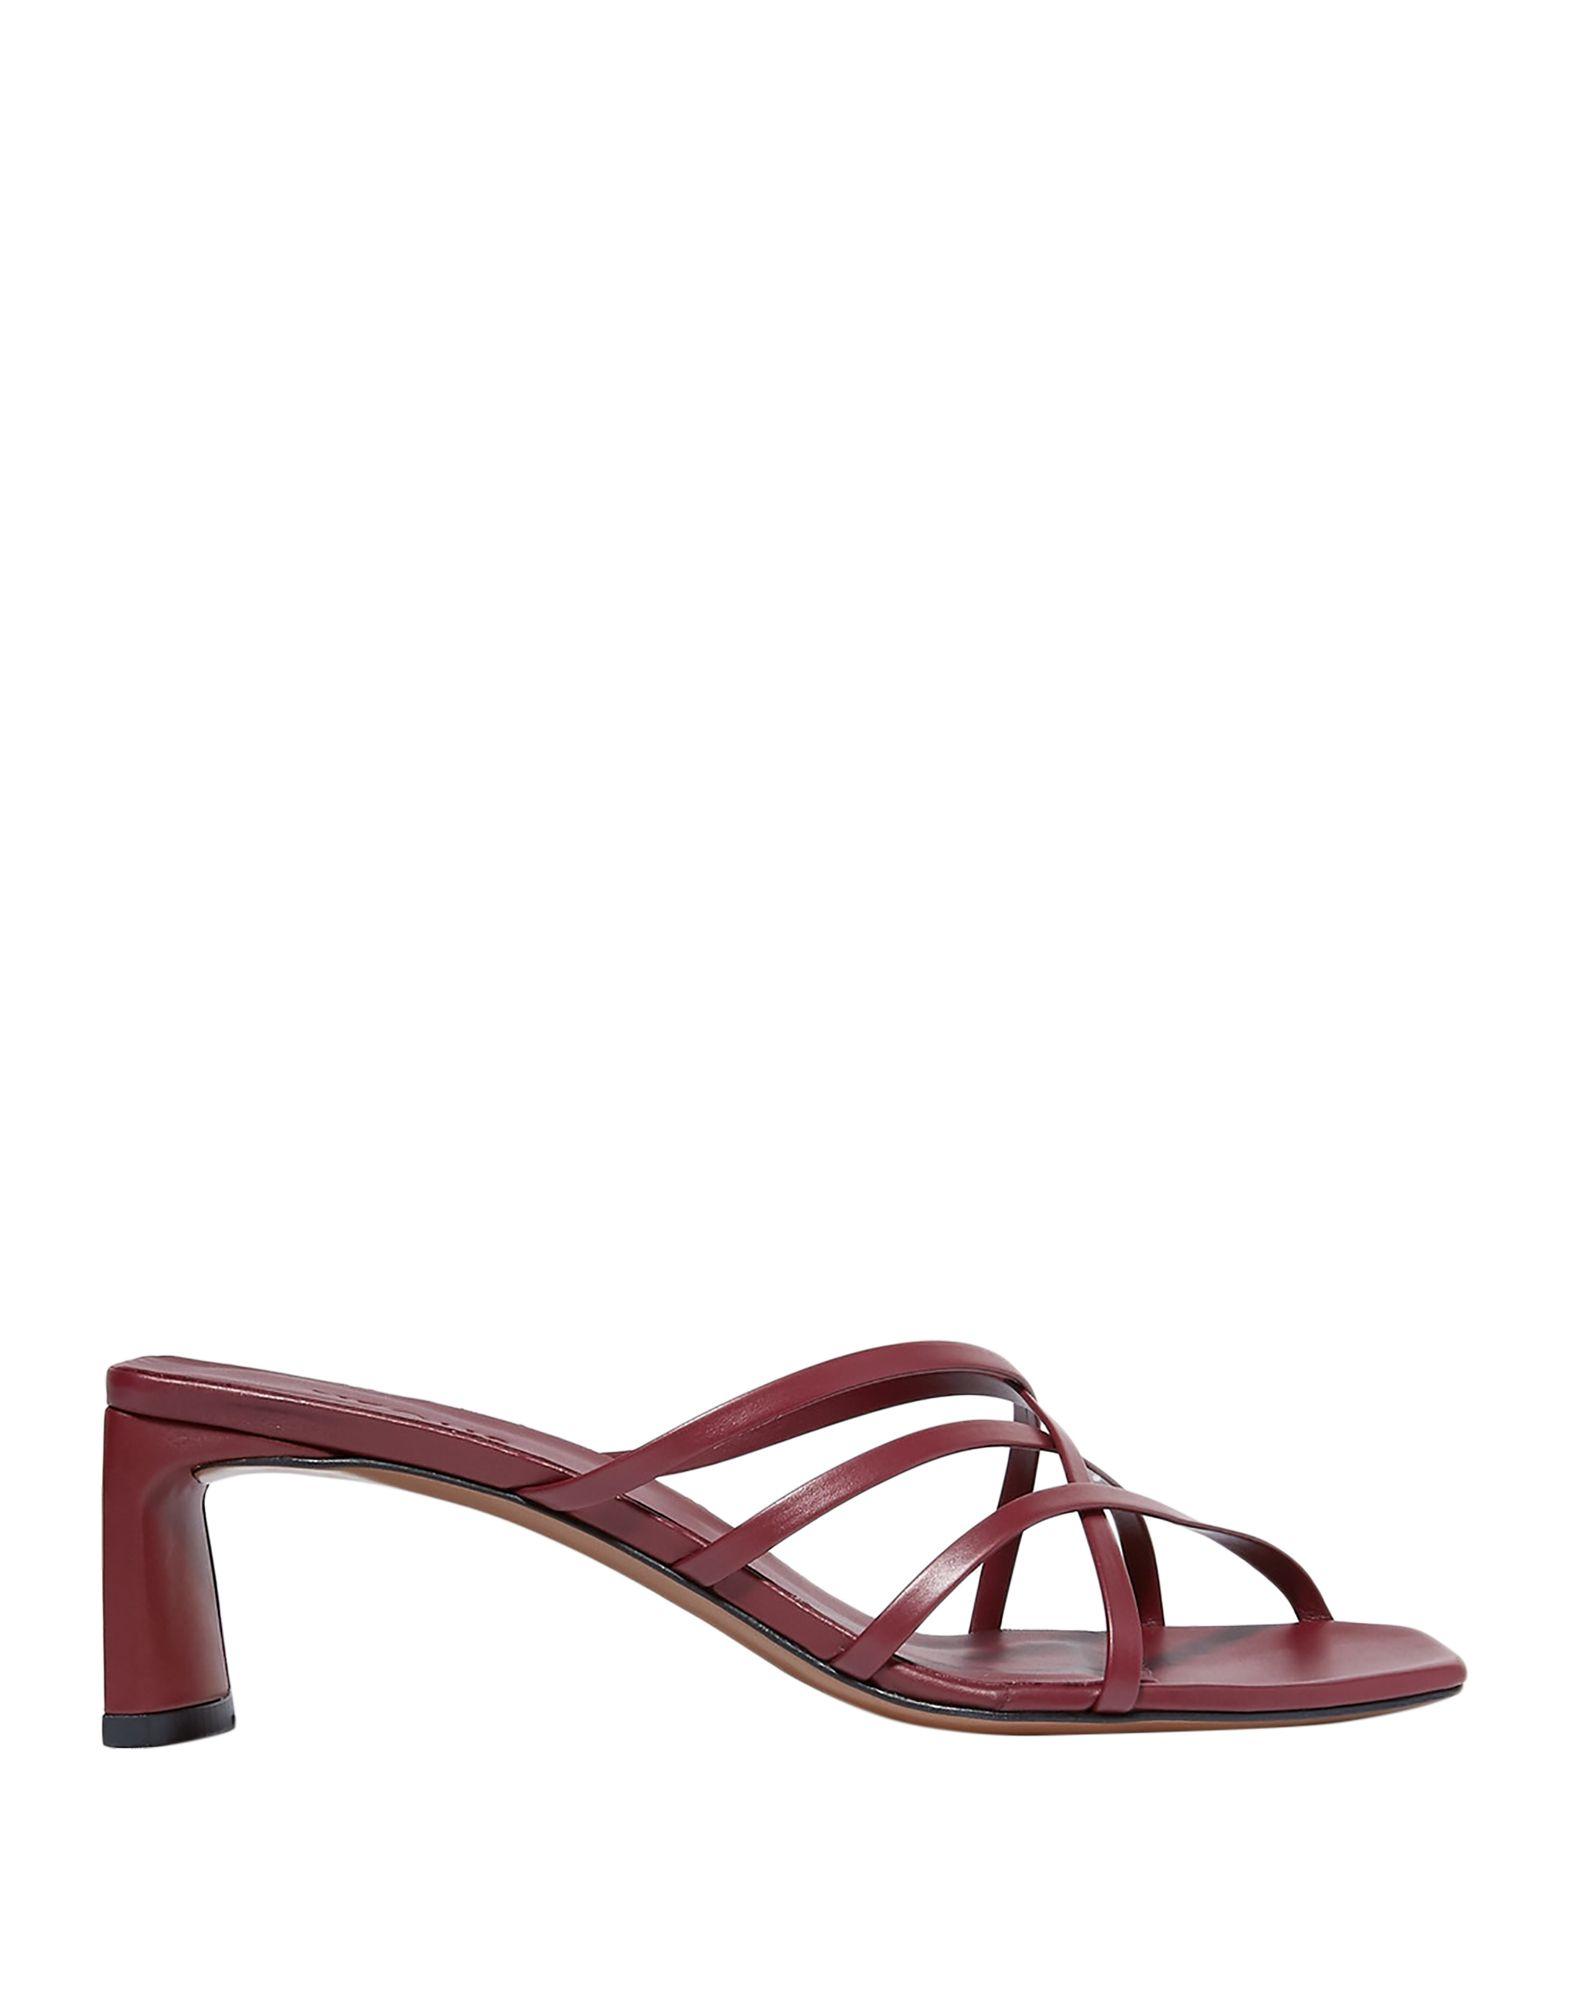 NEOUS Sandals - Item 11873553